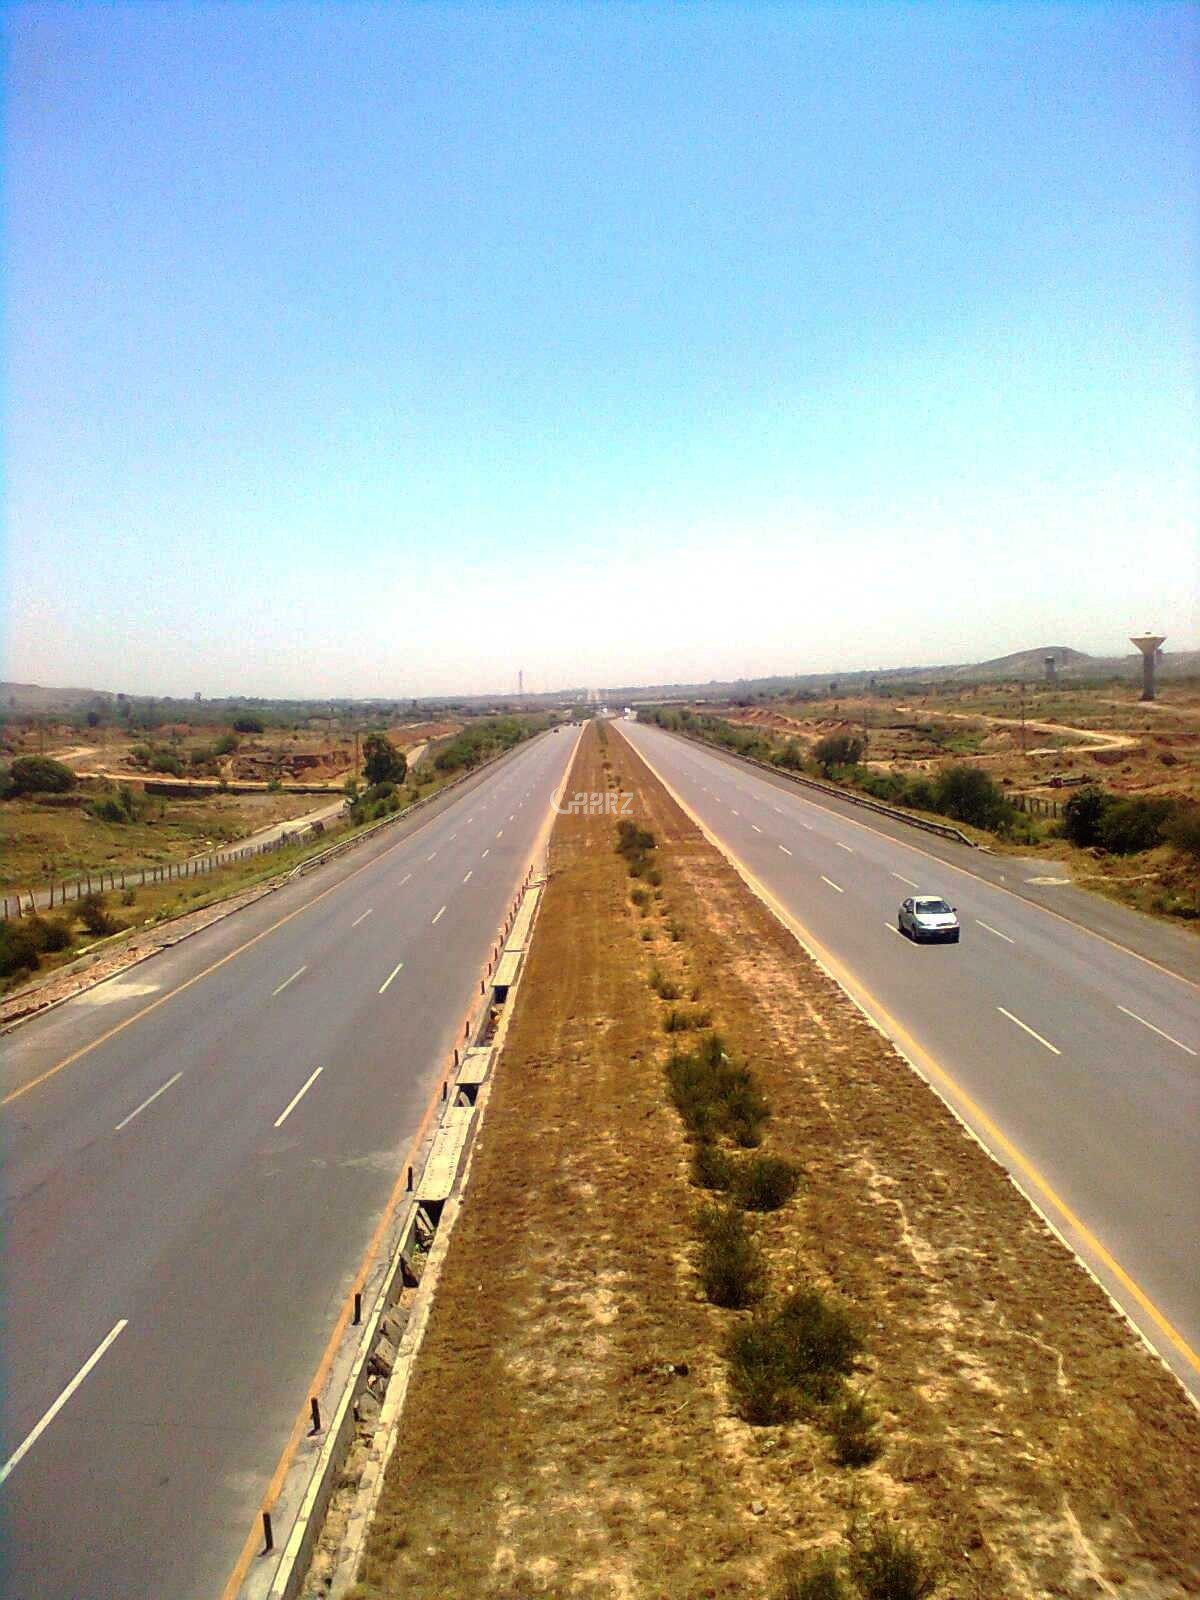 10 Marla Plot in C-18, Islamabad for Sale - Sun Facing